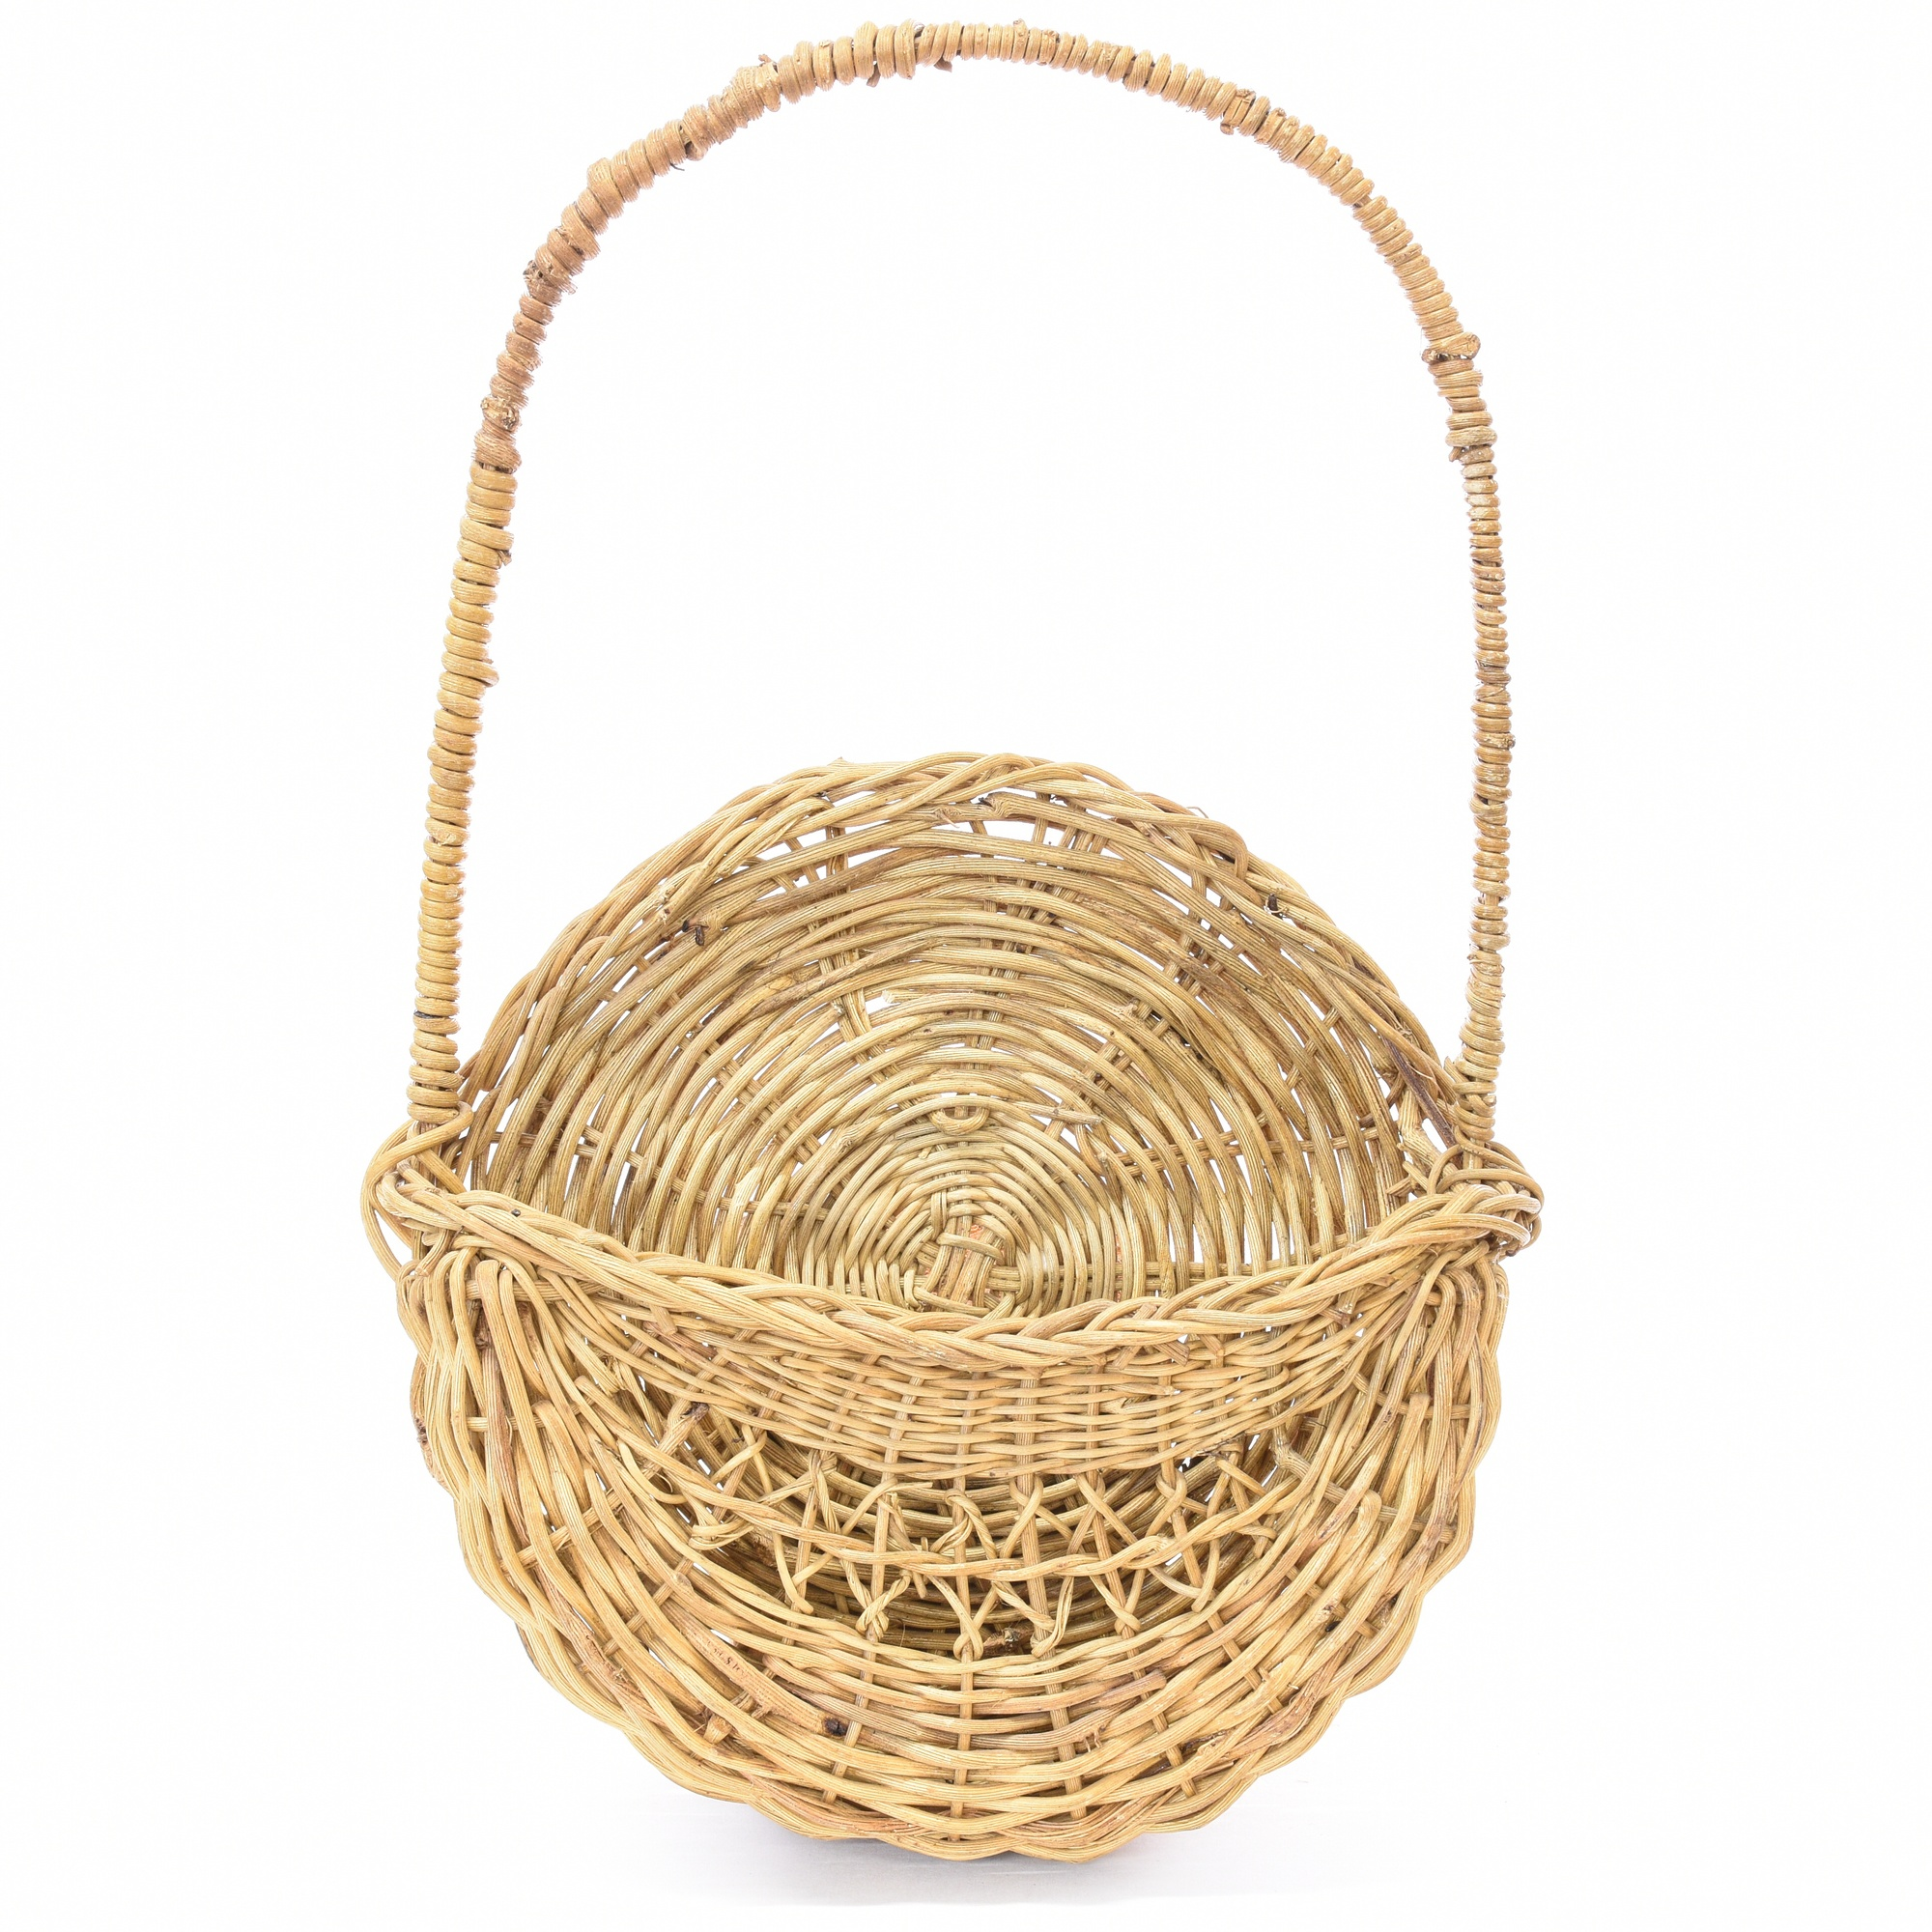 chinese woven wicker hanging wall basket loveseat vintage furniture san diego los angeles. Black Bedroom Furniture Sets. Home Design Ideas